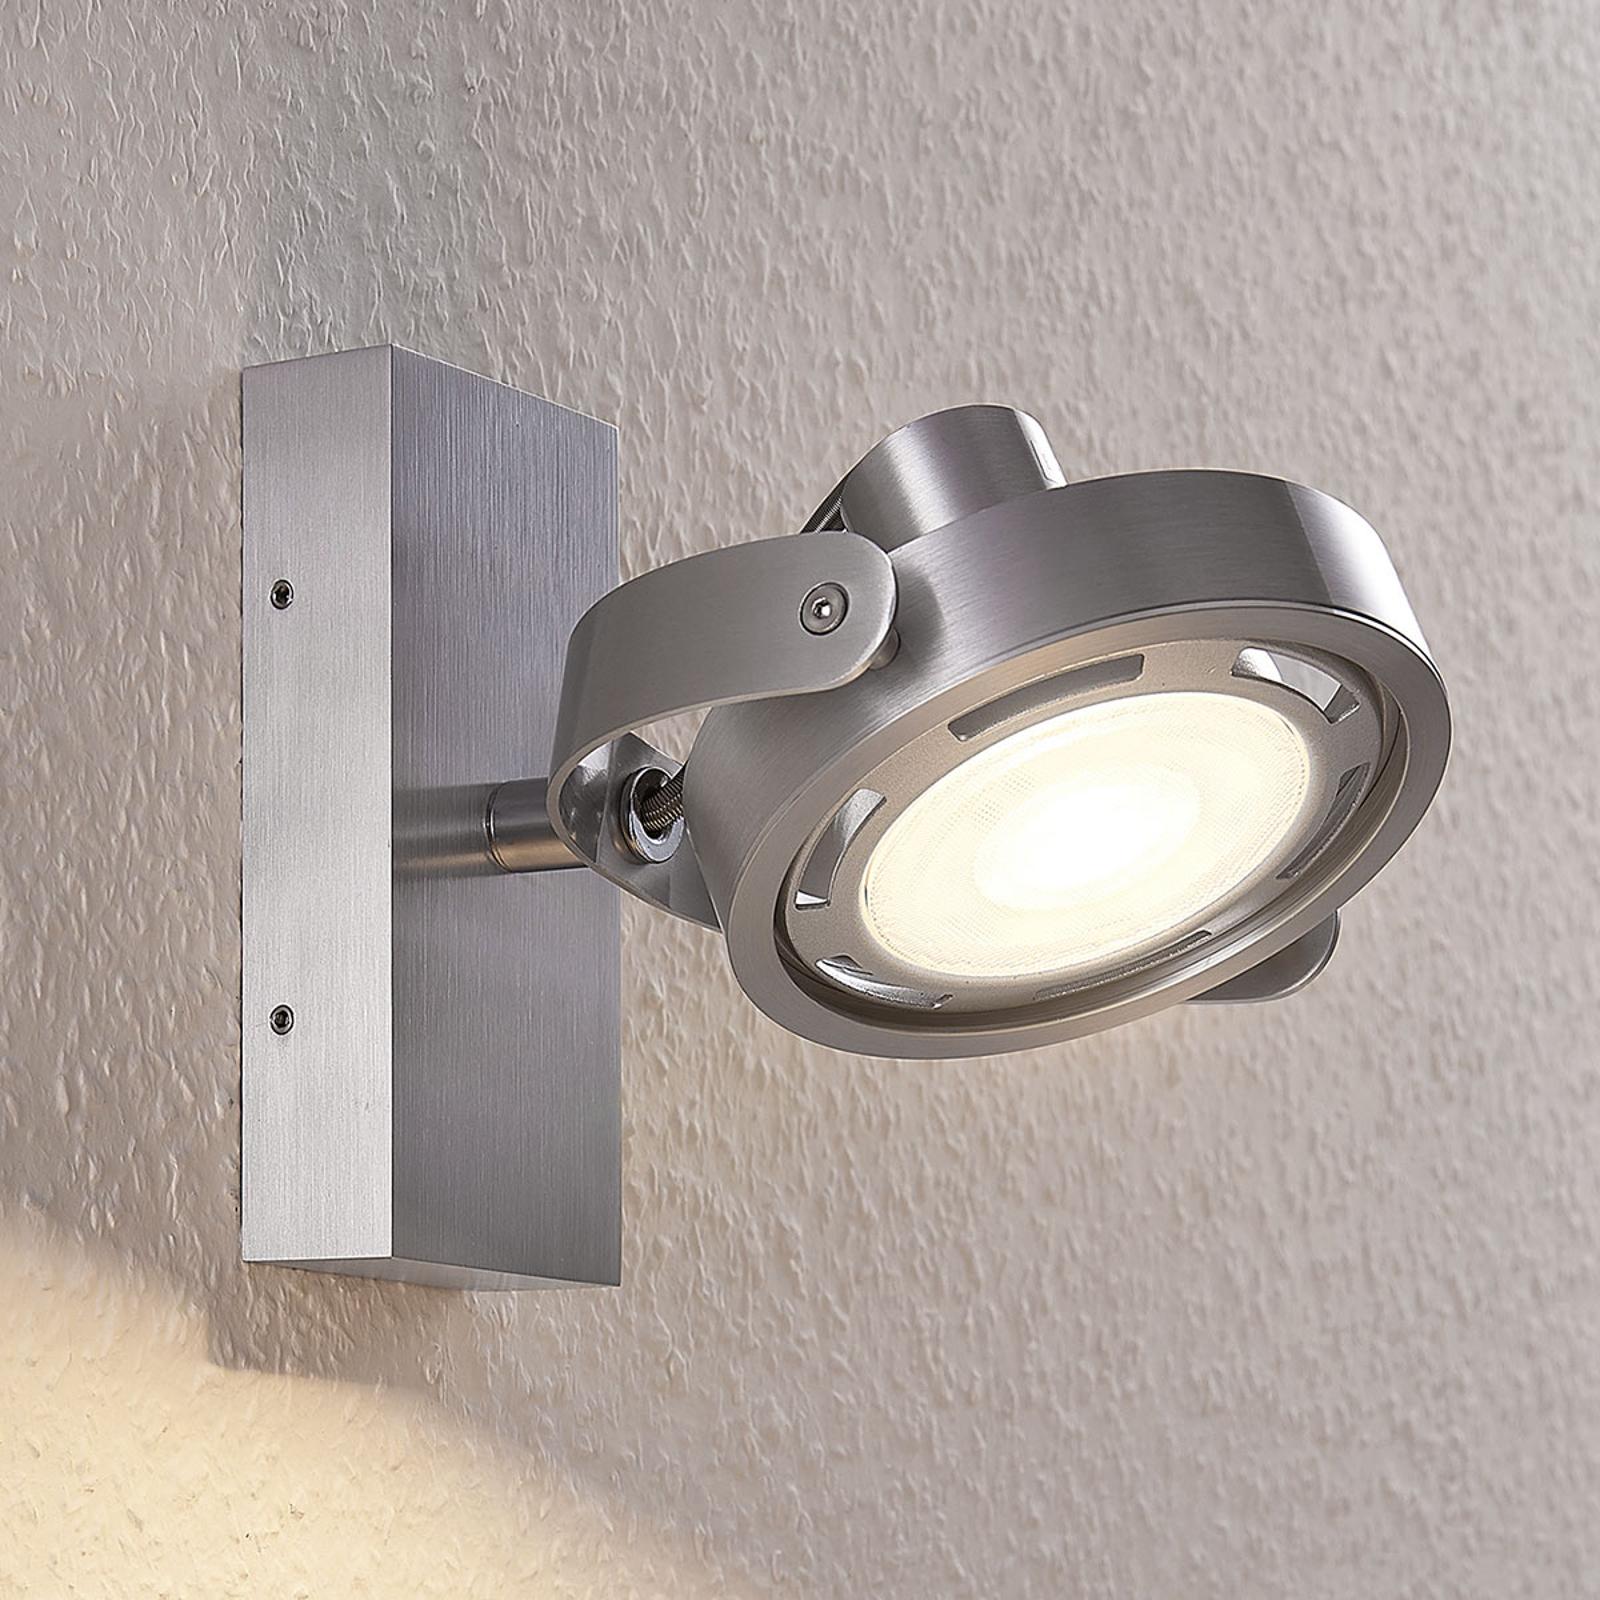 LED-Strahler Munin, dimmbar, alu, 1-flammig